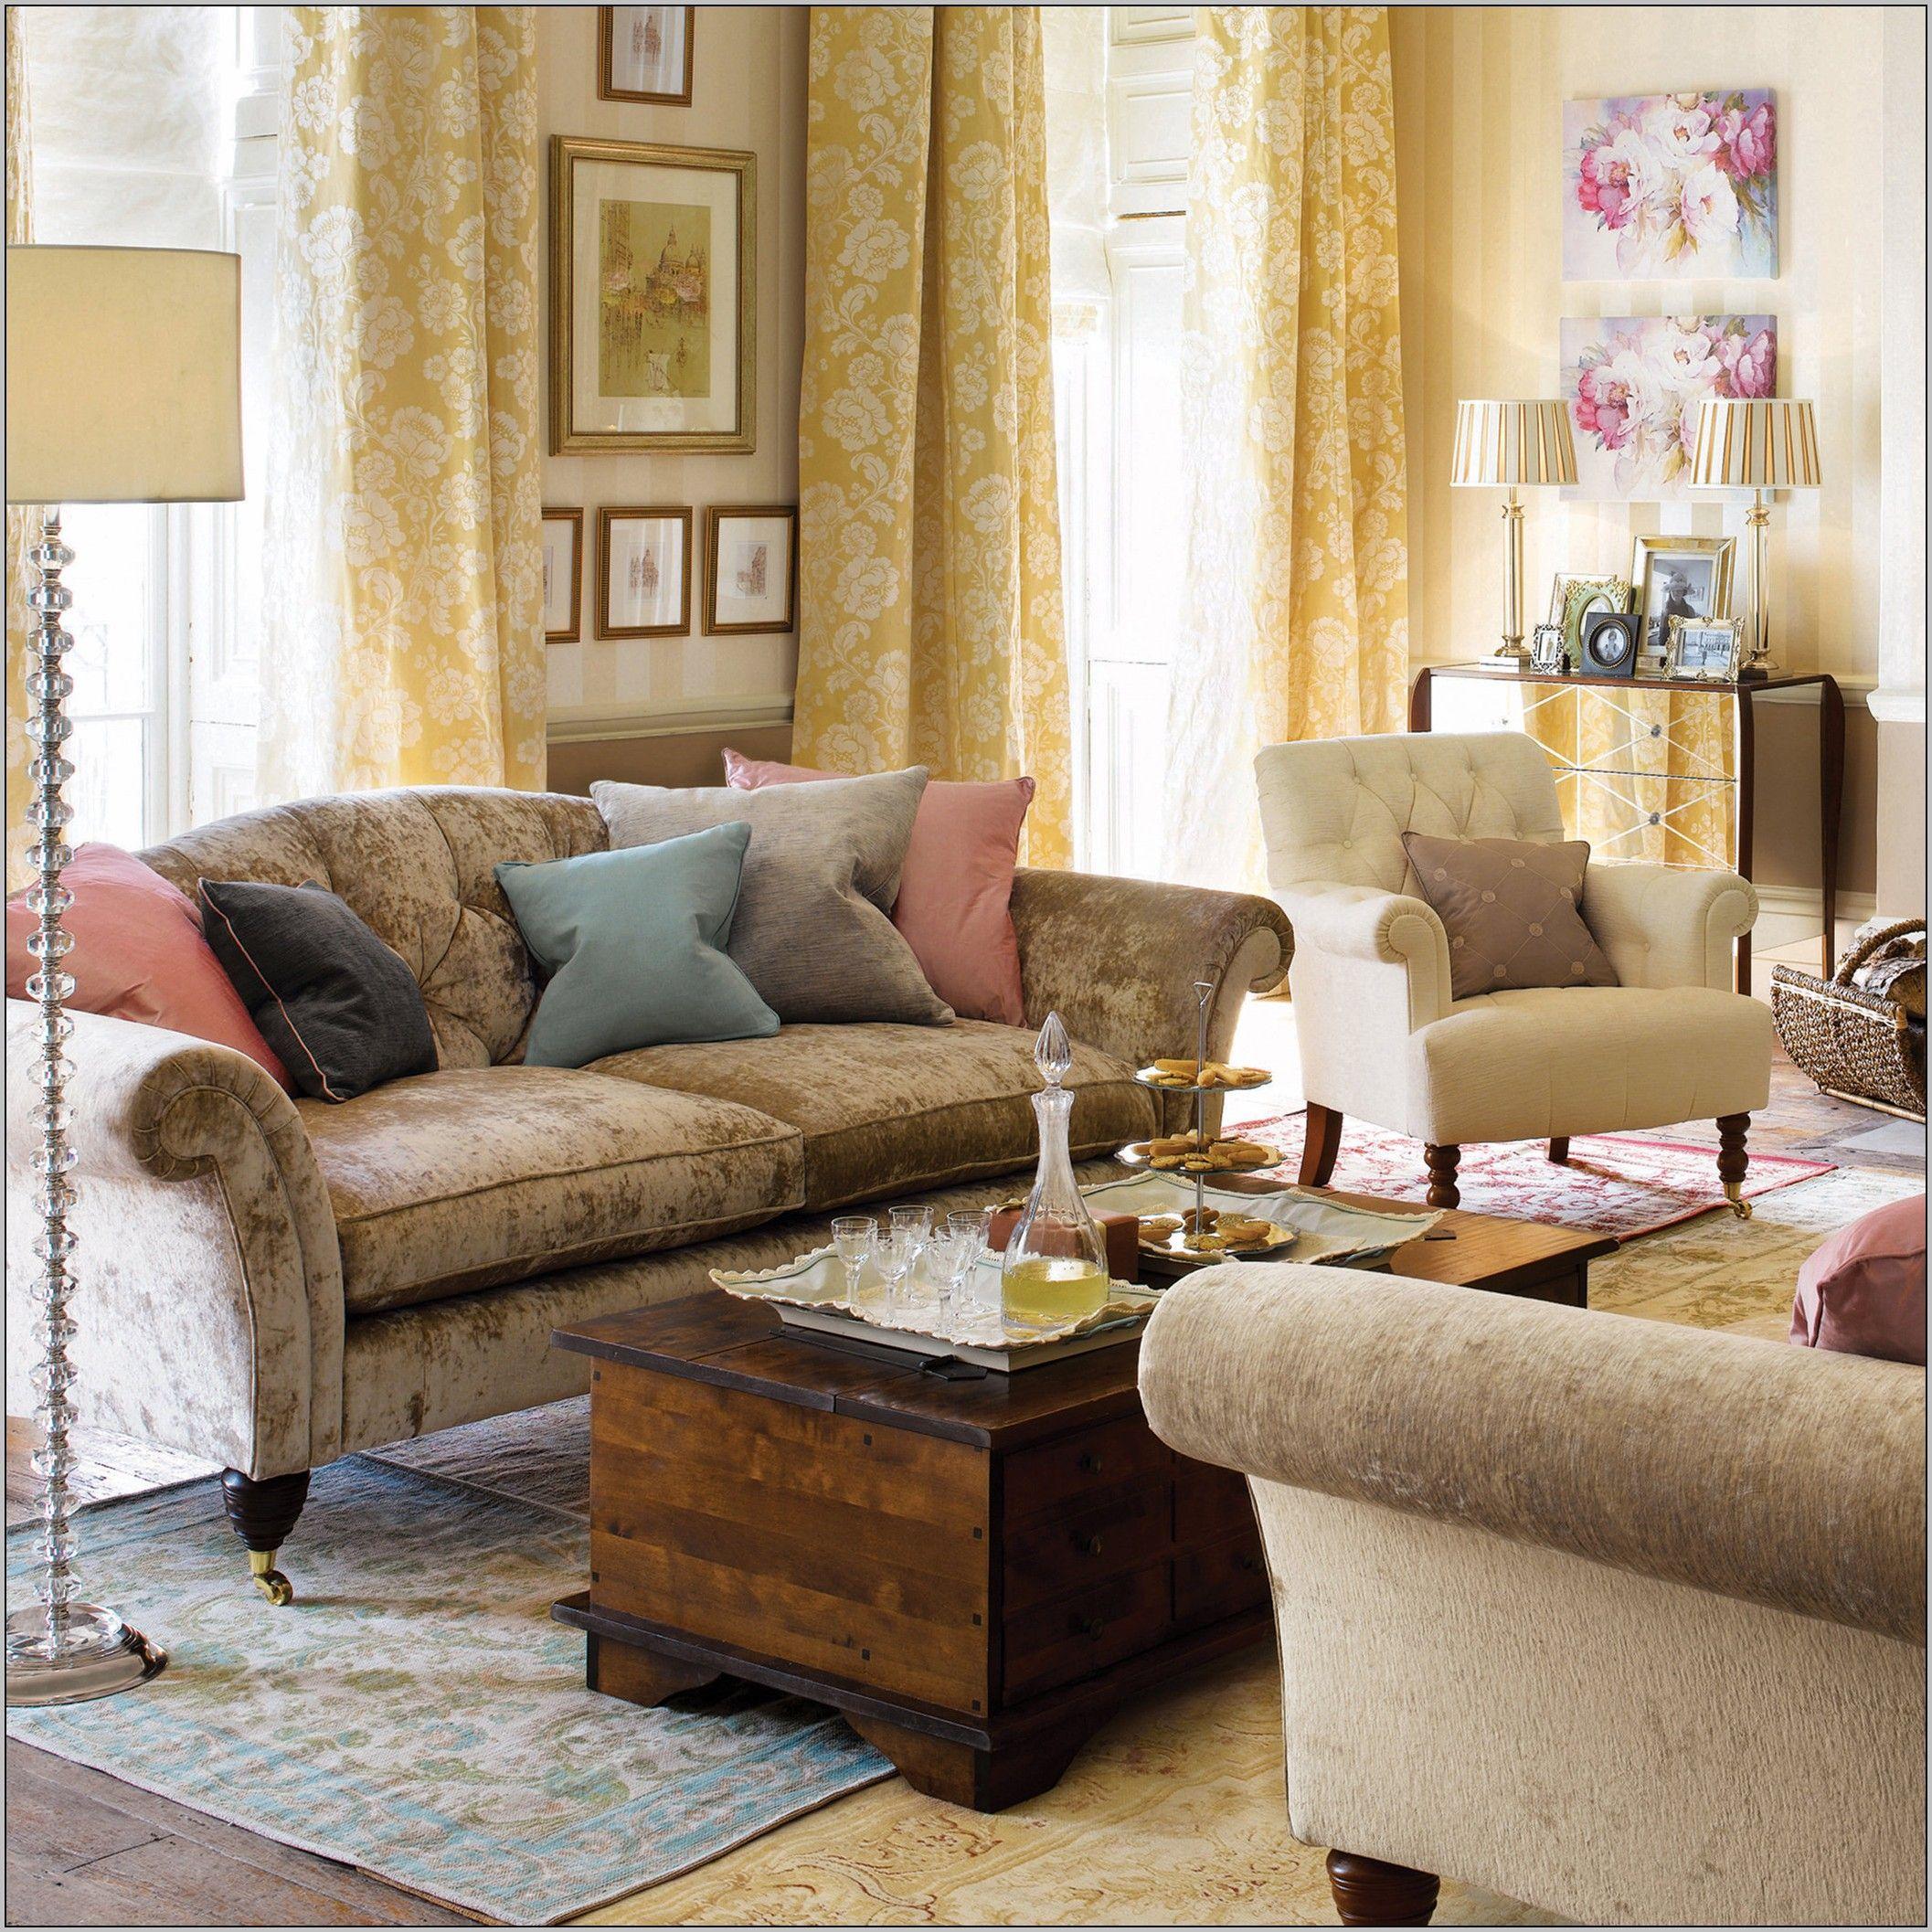 laura ashley living room inspiration in 2018 laura ashley rh pinterest com